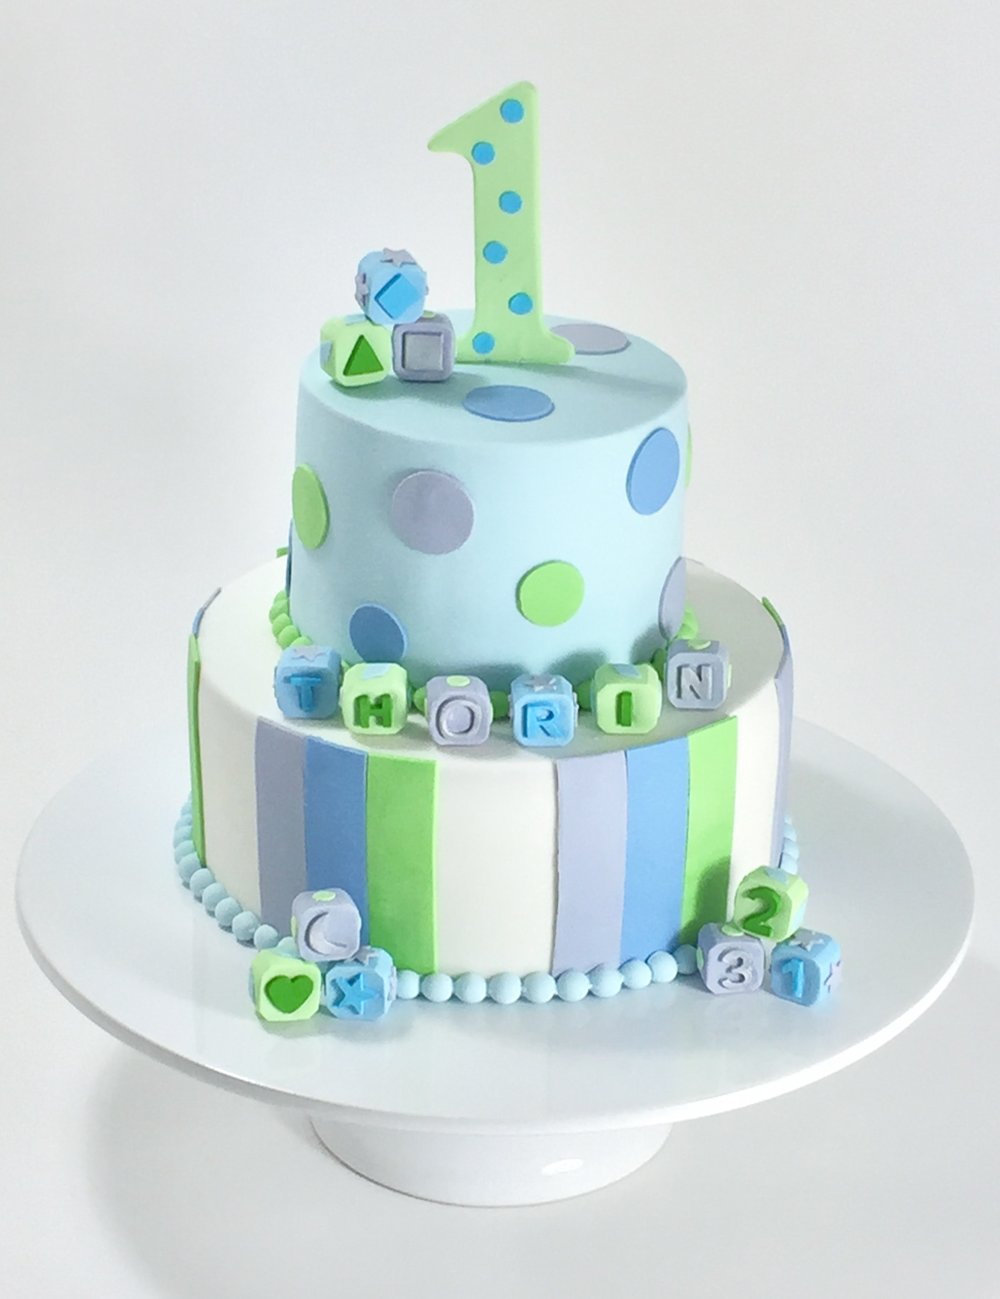 Geburtstagstorte Zum 1. Geburtstag — Barbara Aletter mit Geburtstagstorte Zum 1 Geburtstag